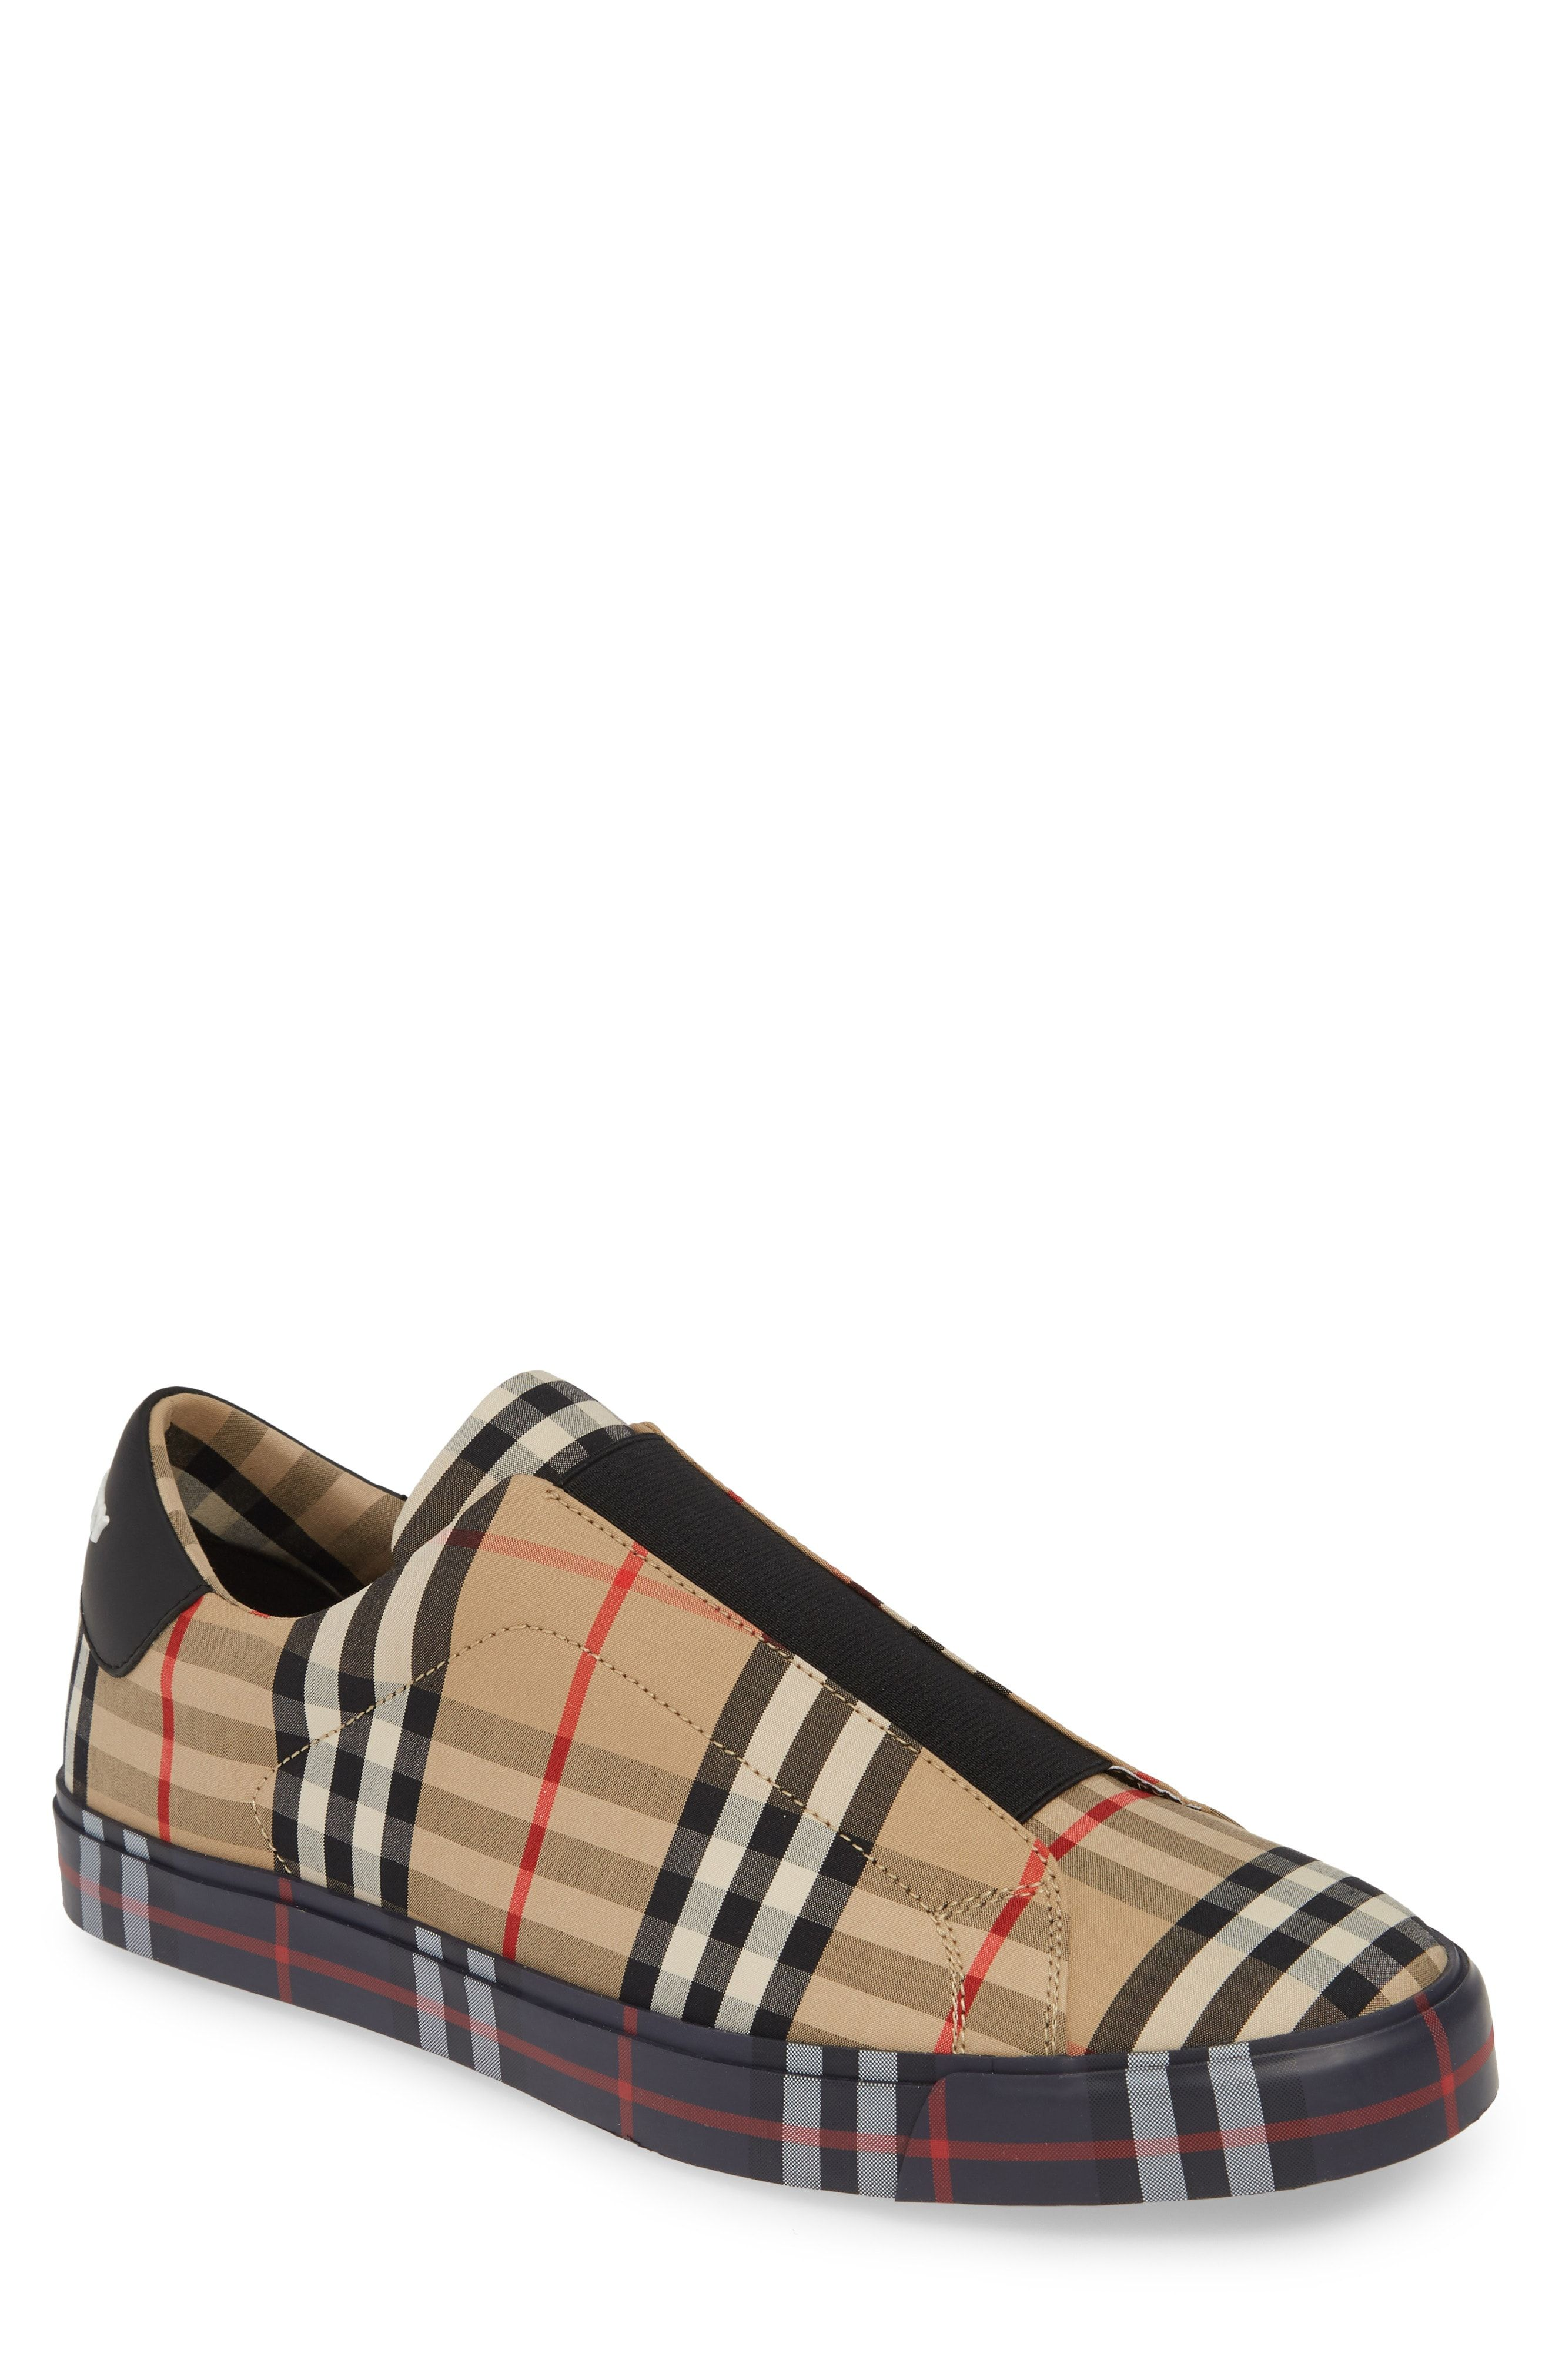 Burberry shoes, Burberry mens shoes